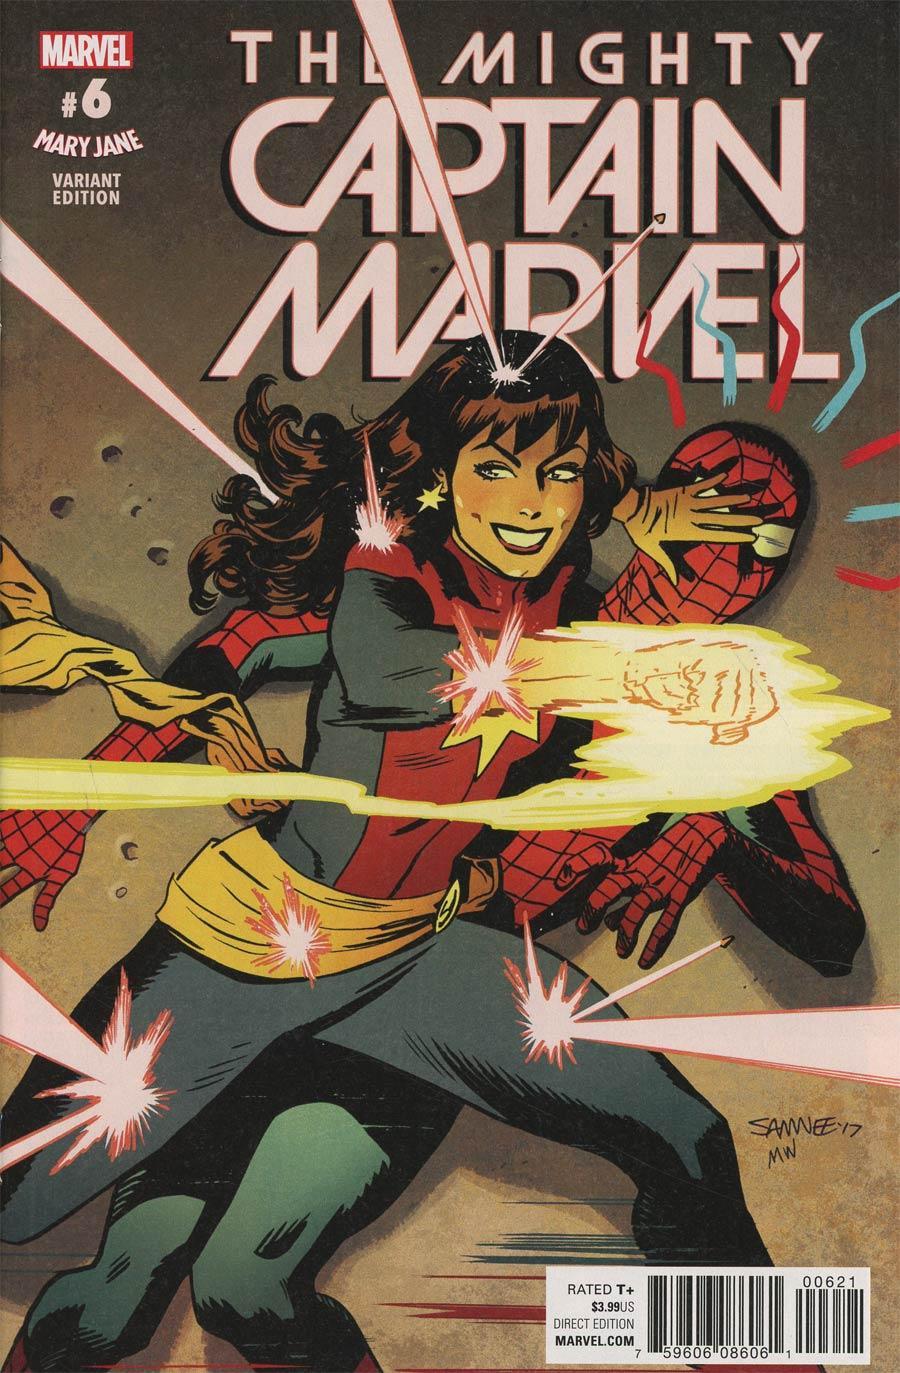 Mighty Captain Marvel #6 Cover B Variant Chris Samnee Mary Jane Cover (Secret Empire Tie-In)